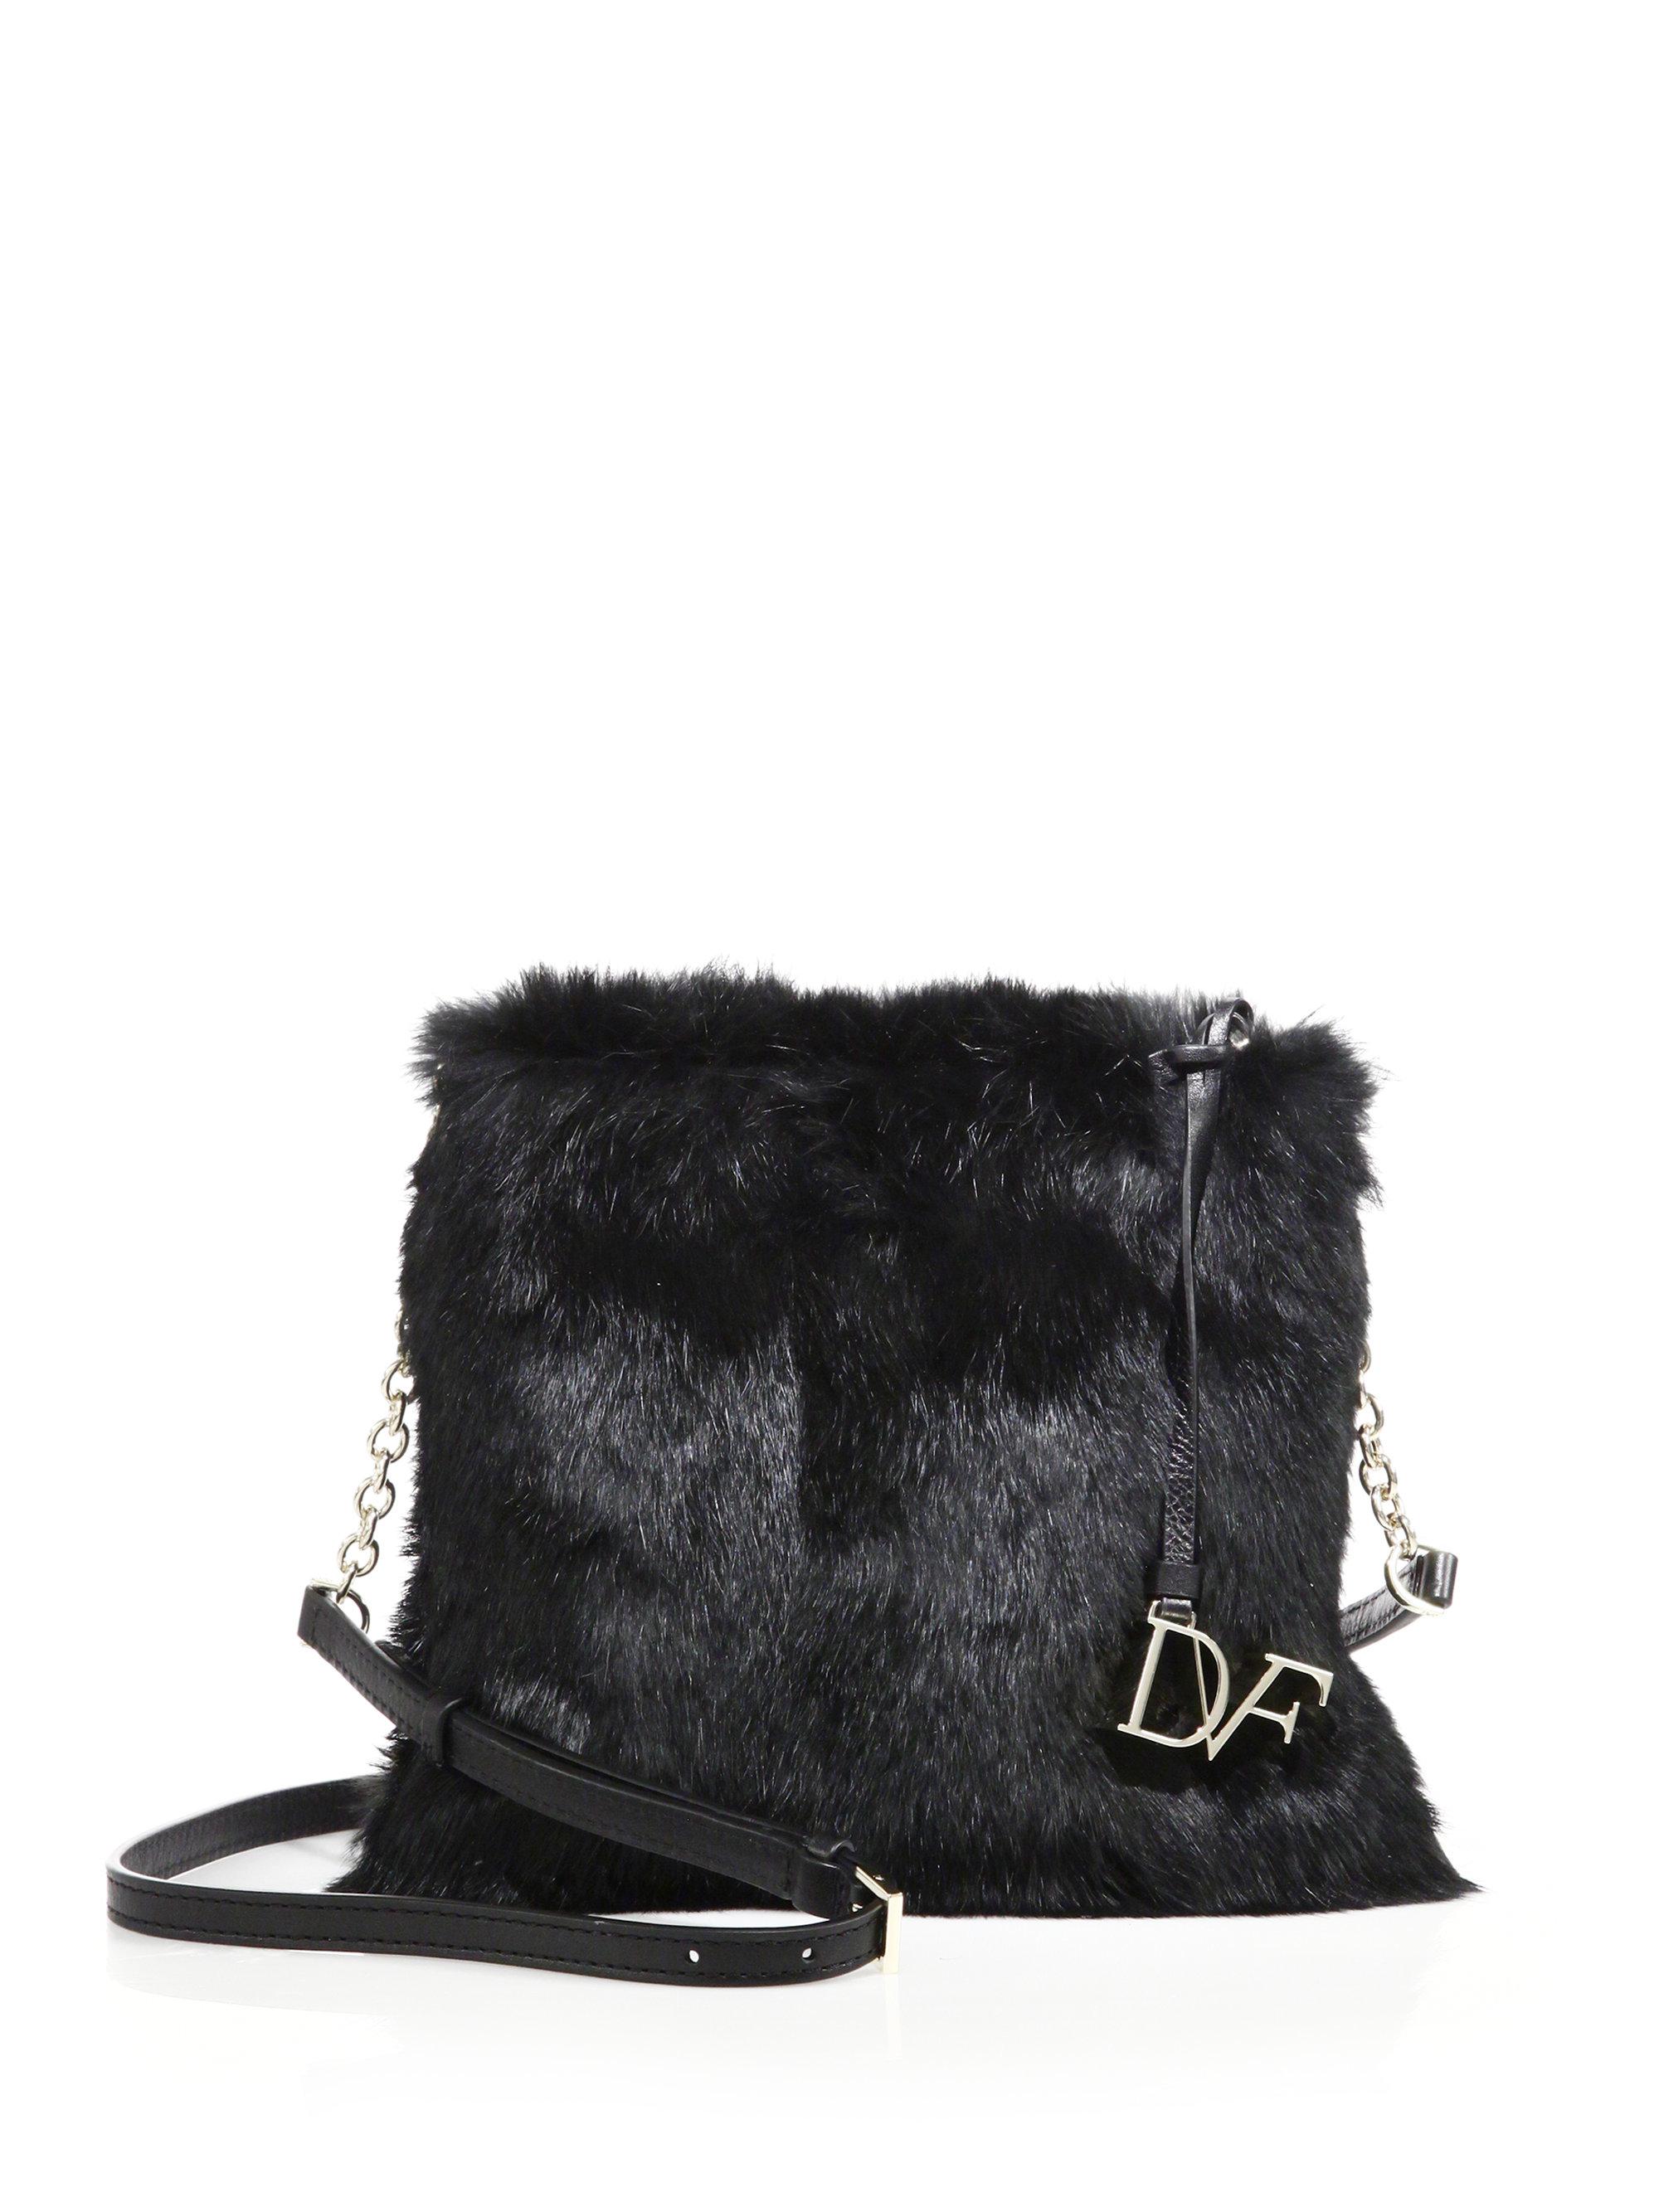 black rabbit fur handbag handbags 2018